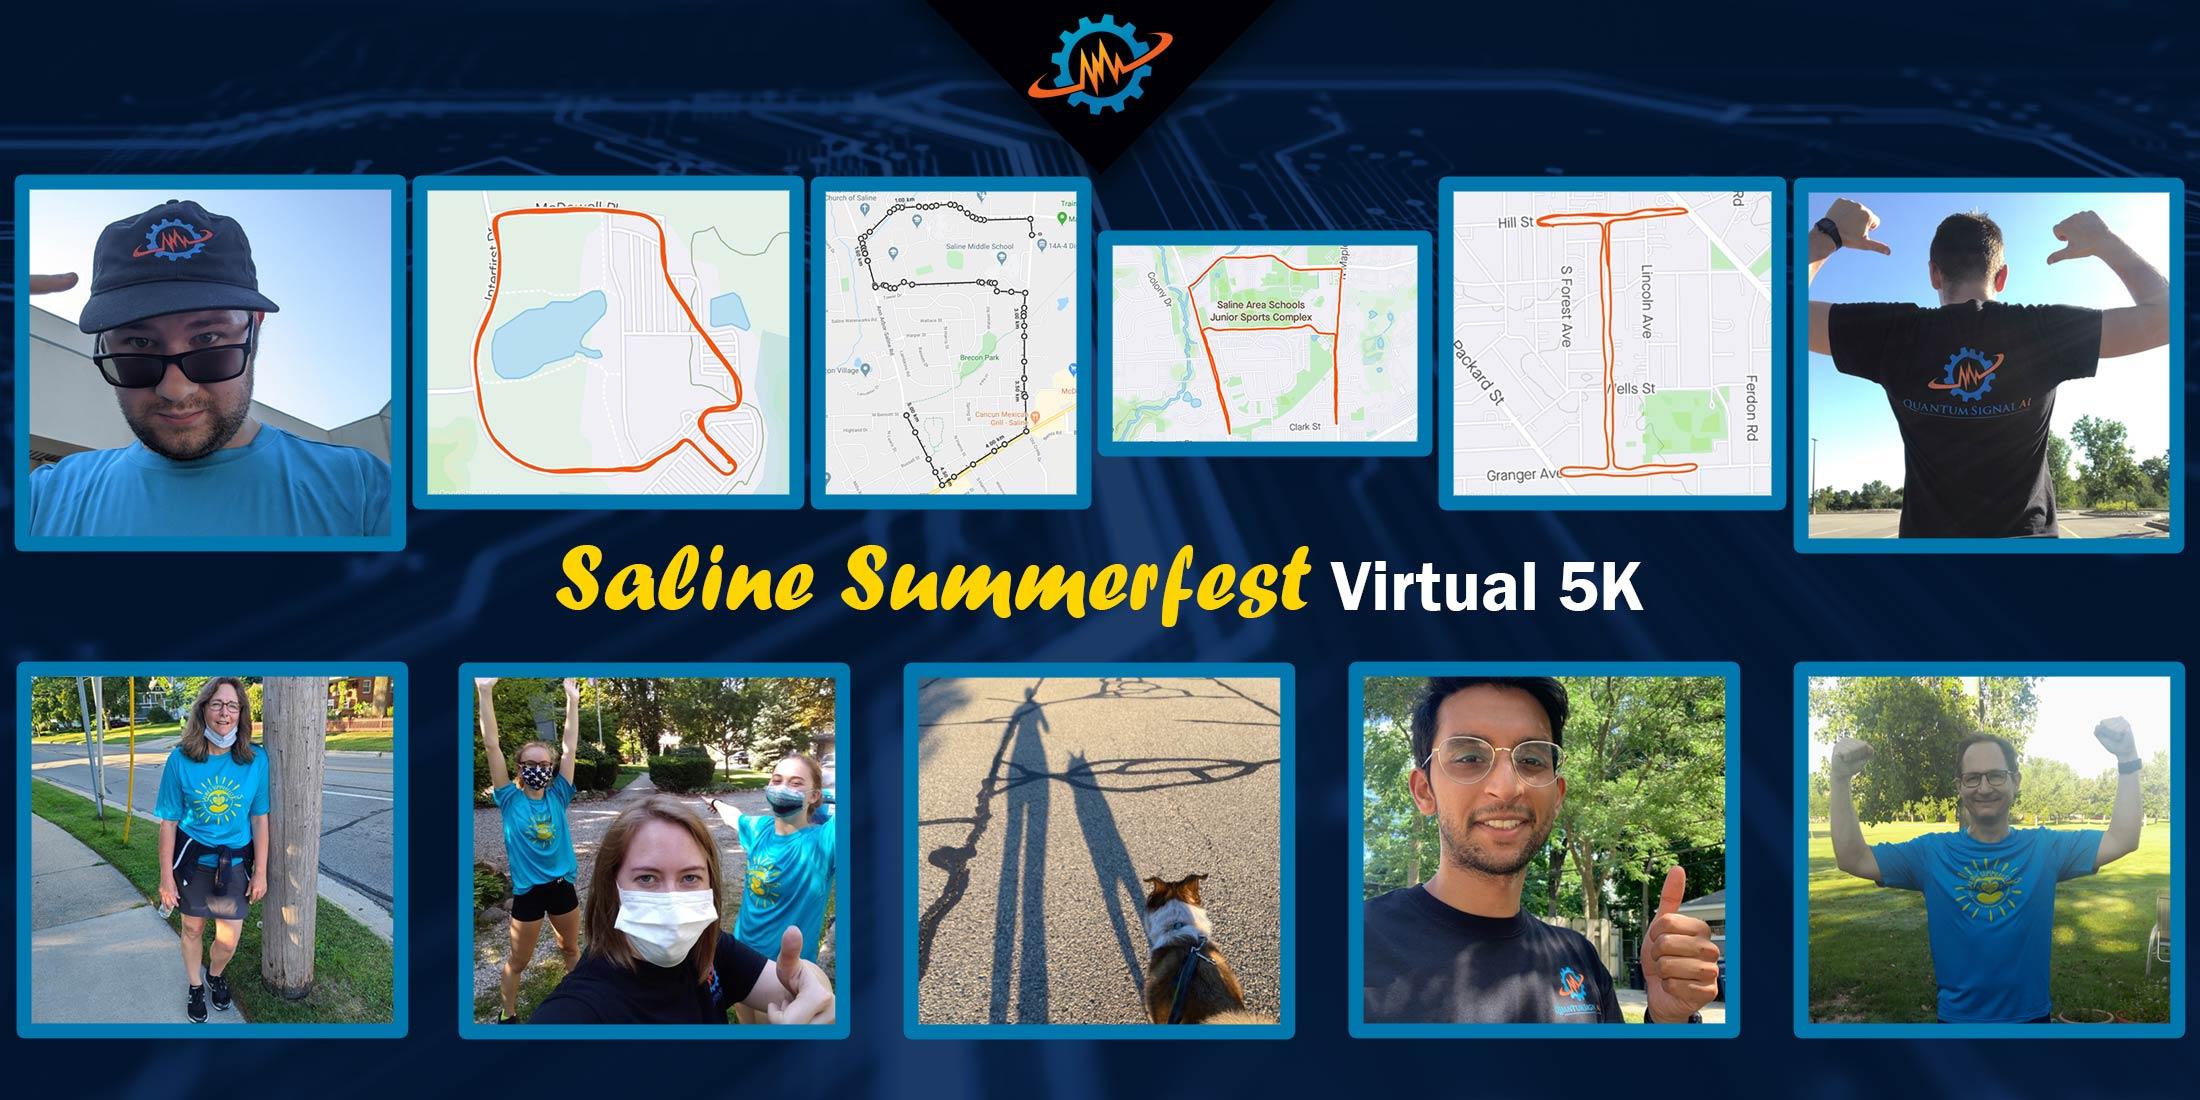 Saline Summerfest 2020 Virtual 5k selfies and race courses